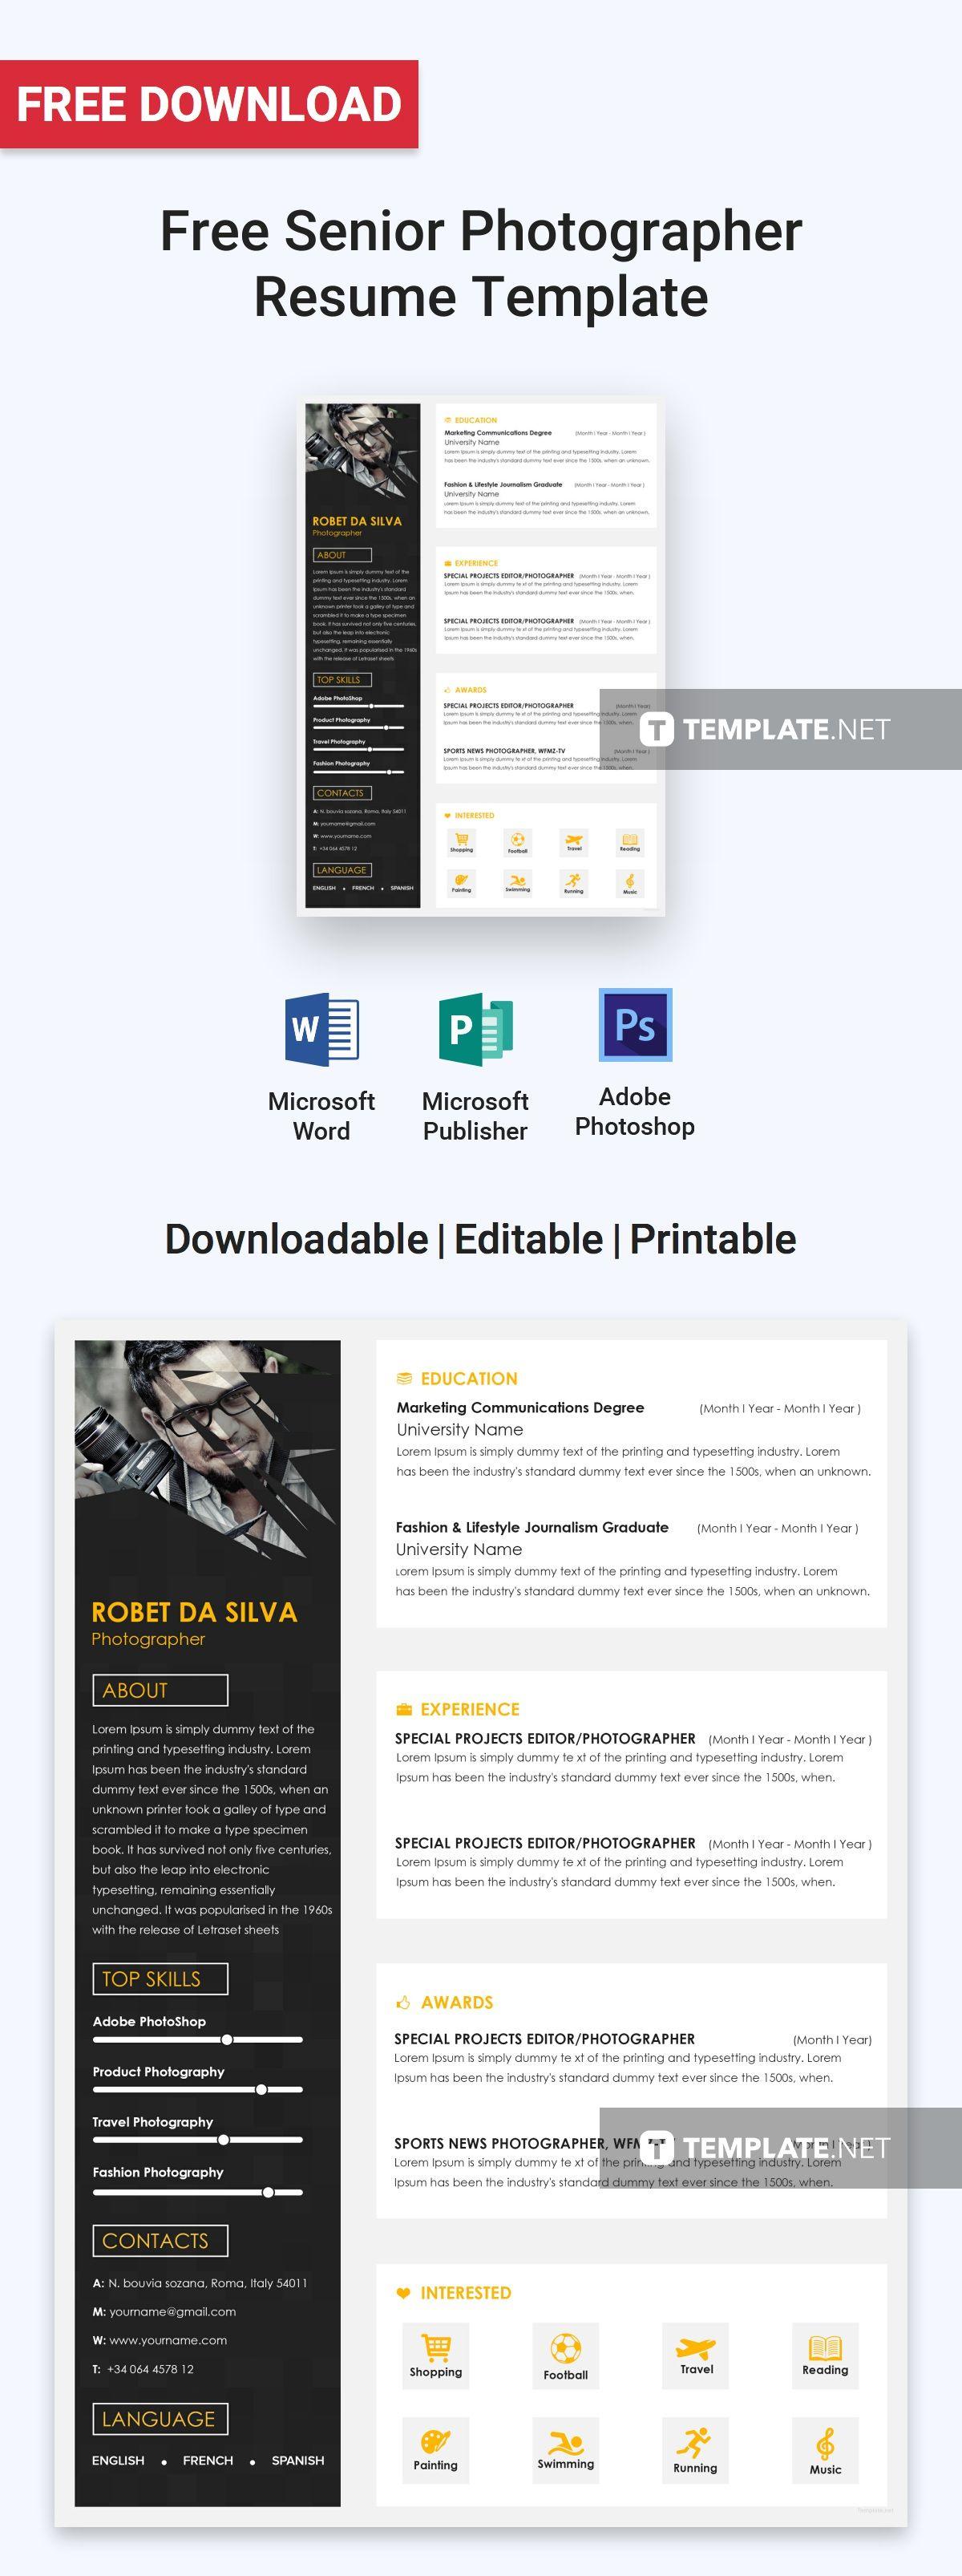 Free Senior Photographer Resume Cv Template Word Doc Psd Apple Mac Pages Publisher Photographer Resume Resume Design Good Resume Examples